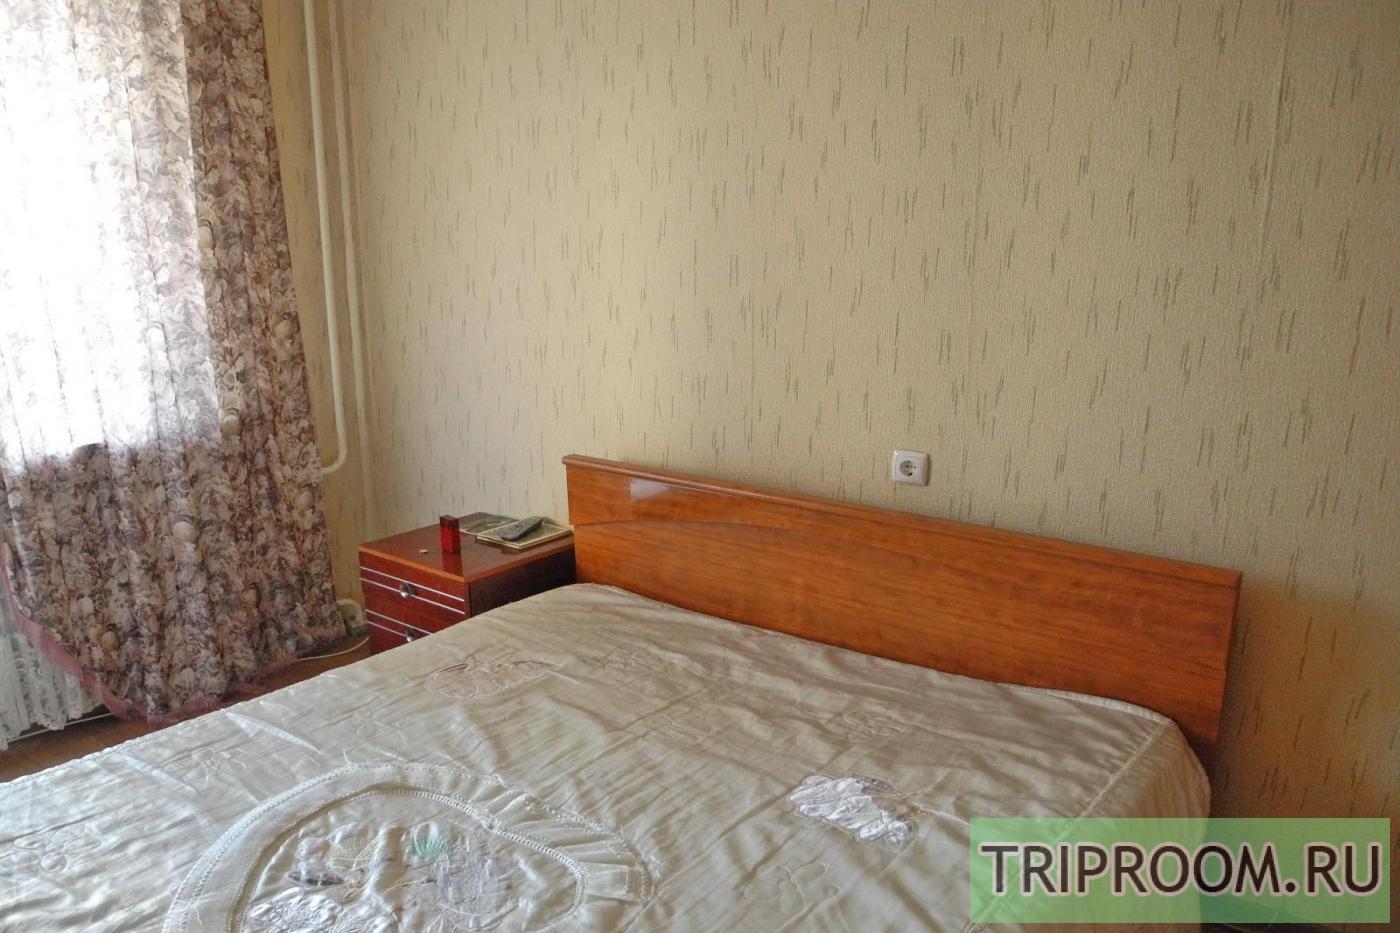 2-комнатная квартира посуточно (вариант № 3868), ул. Кропоткина улица, фото № 5